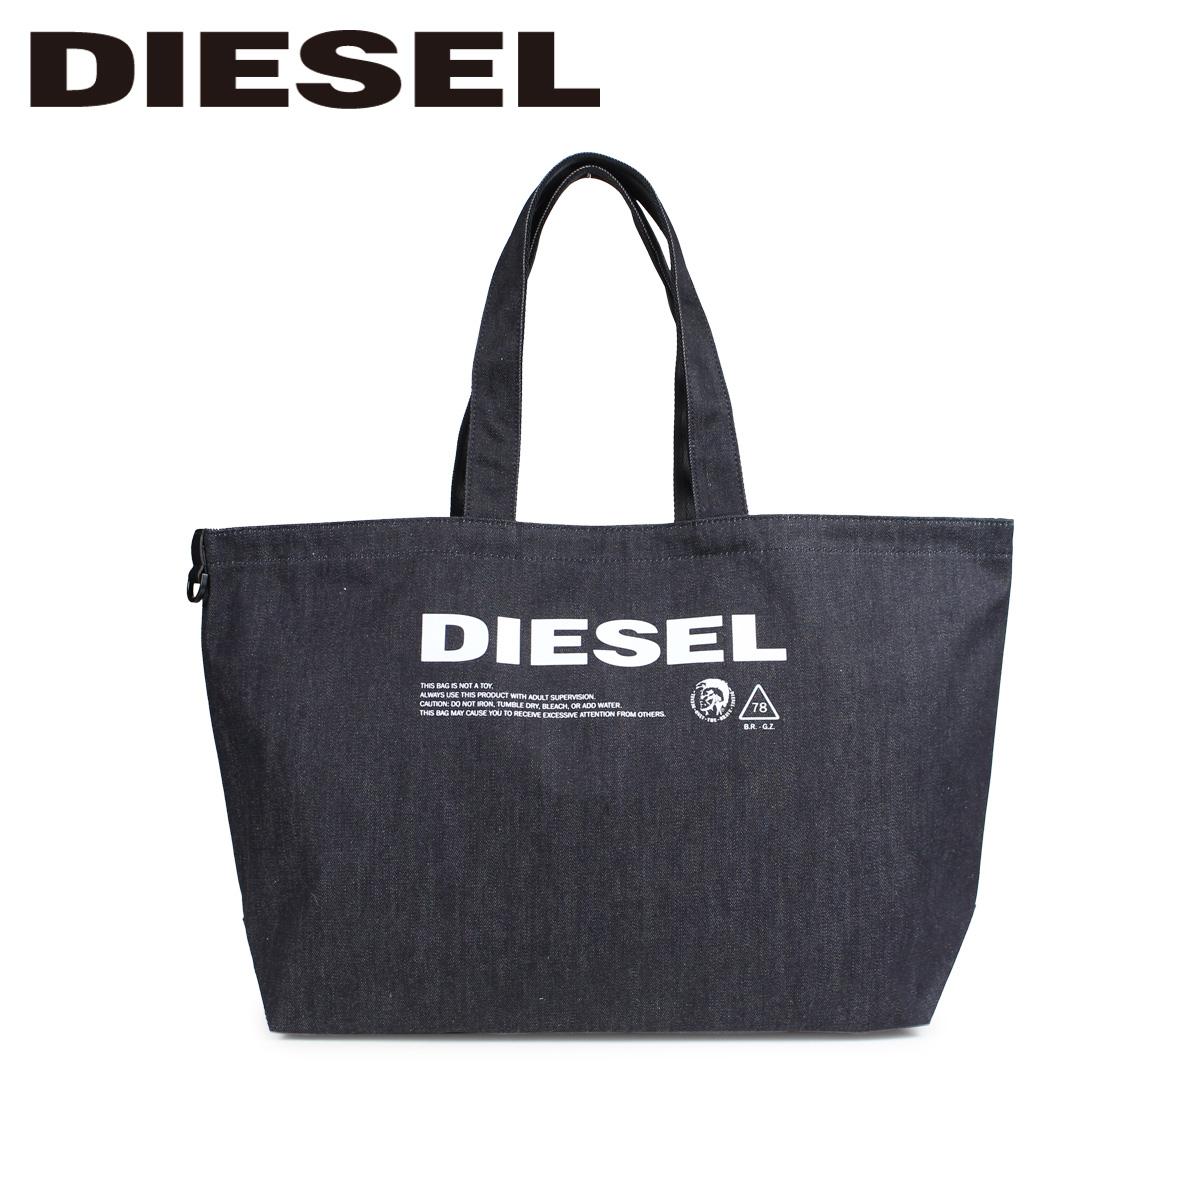 DIESEL D-THISBAG SHOPPER L ディーゼル バッグ トートバッグ メンズ レディース ダークネイビー X05513 PR413 [3/12 新入荷]